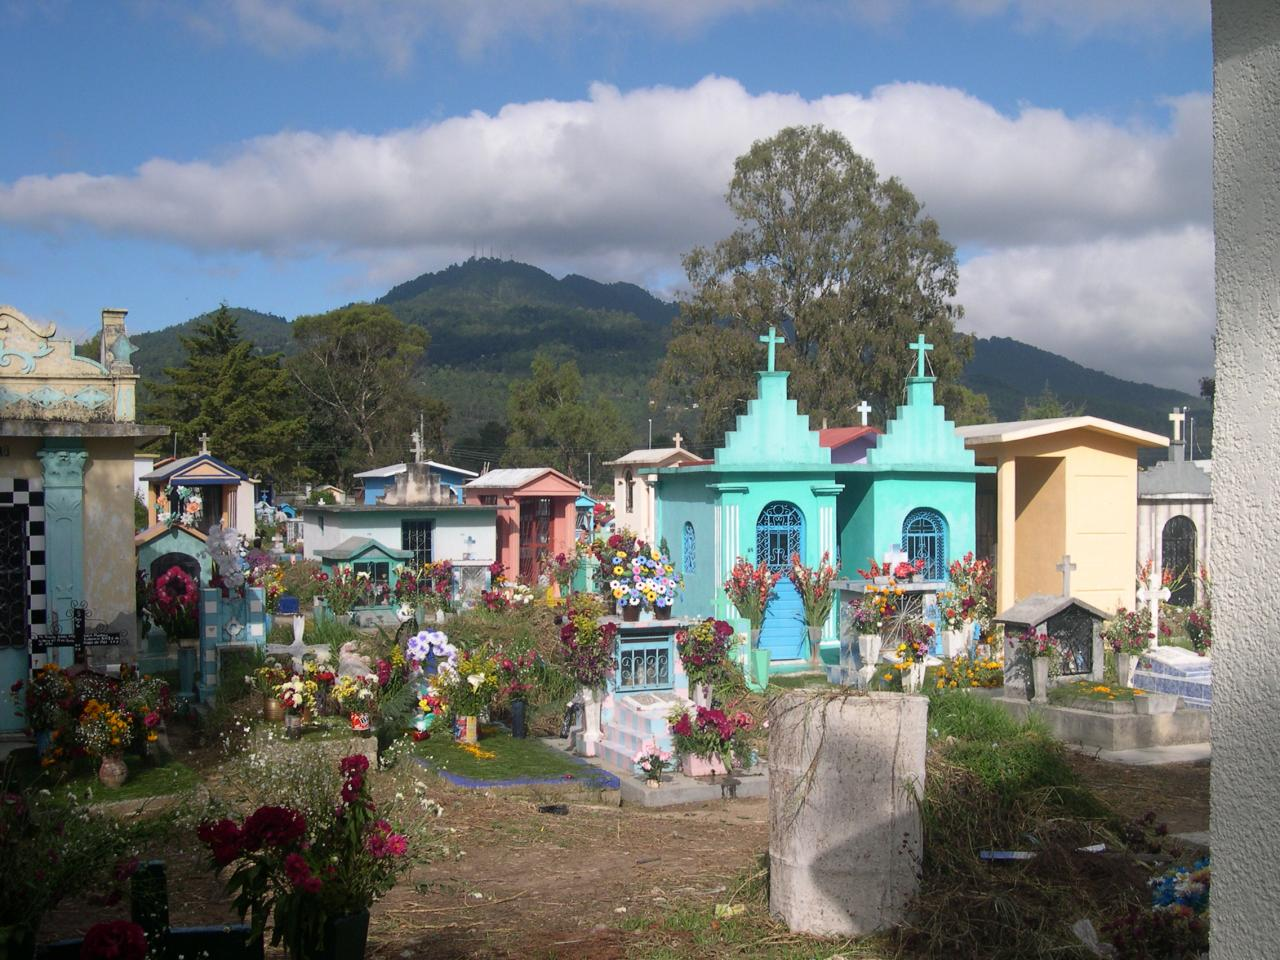 Cimetierre de San Cristobal de las Casas